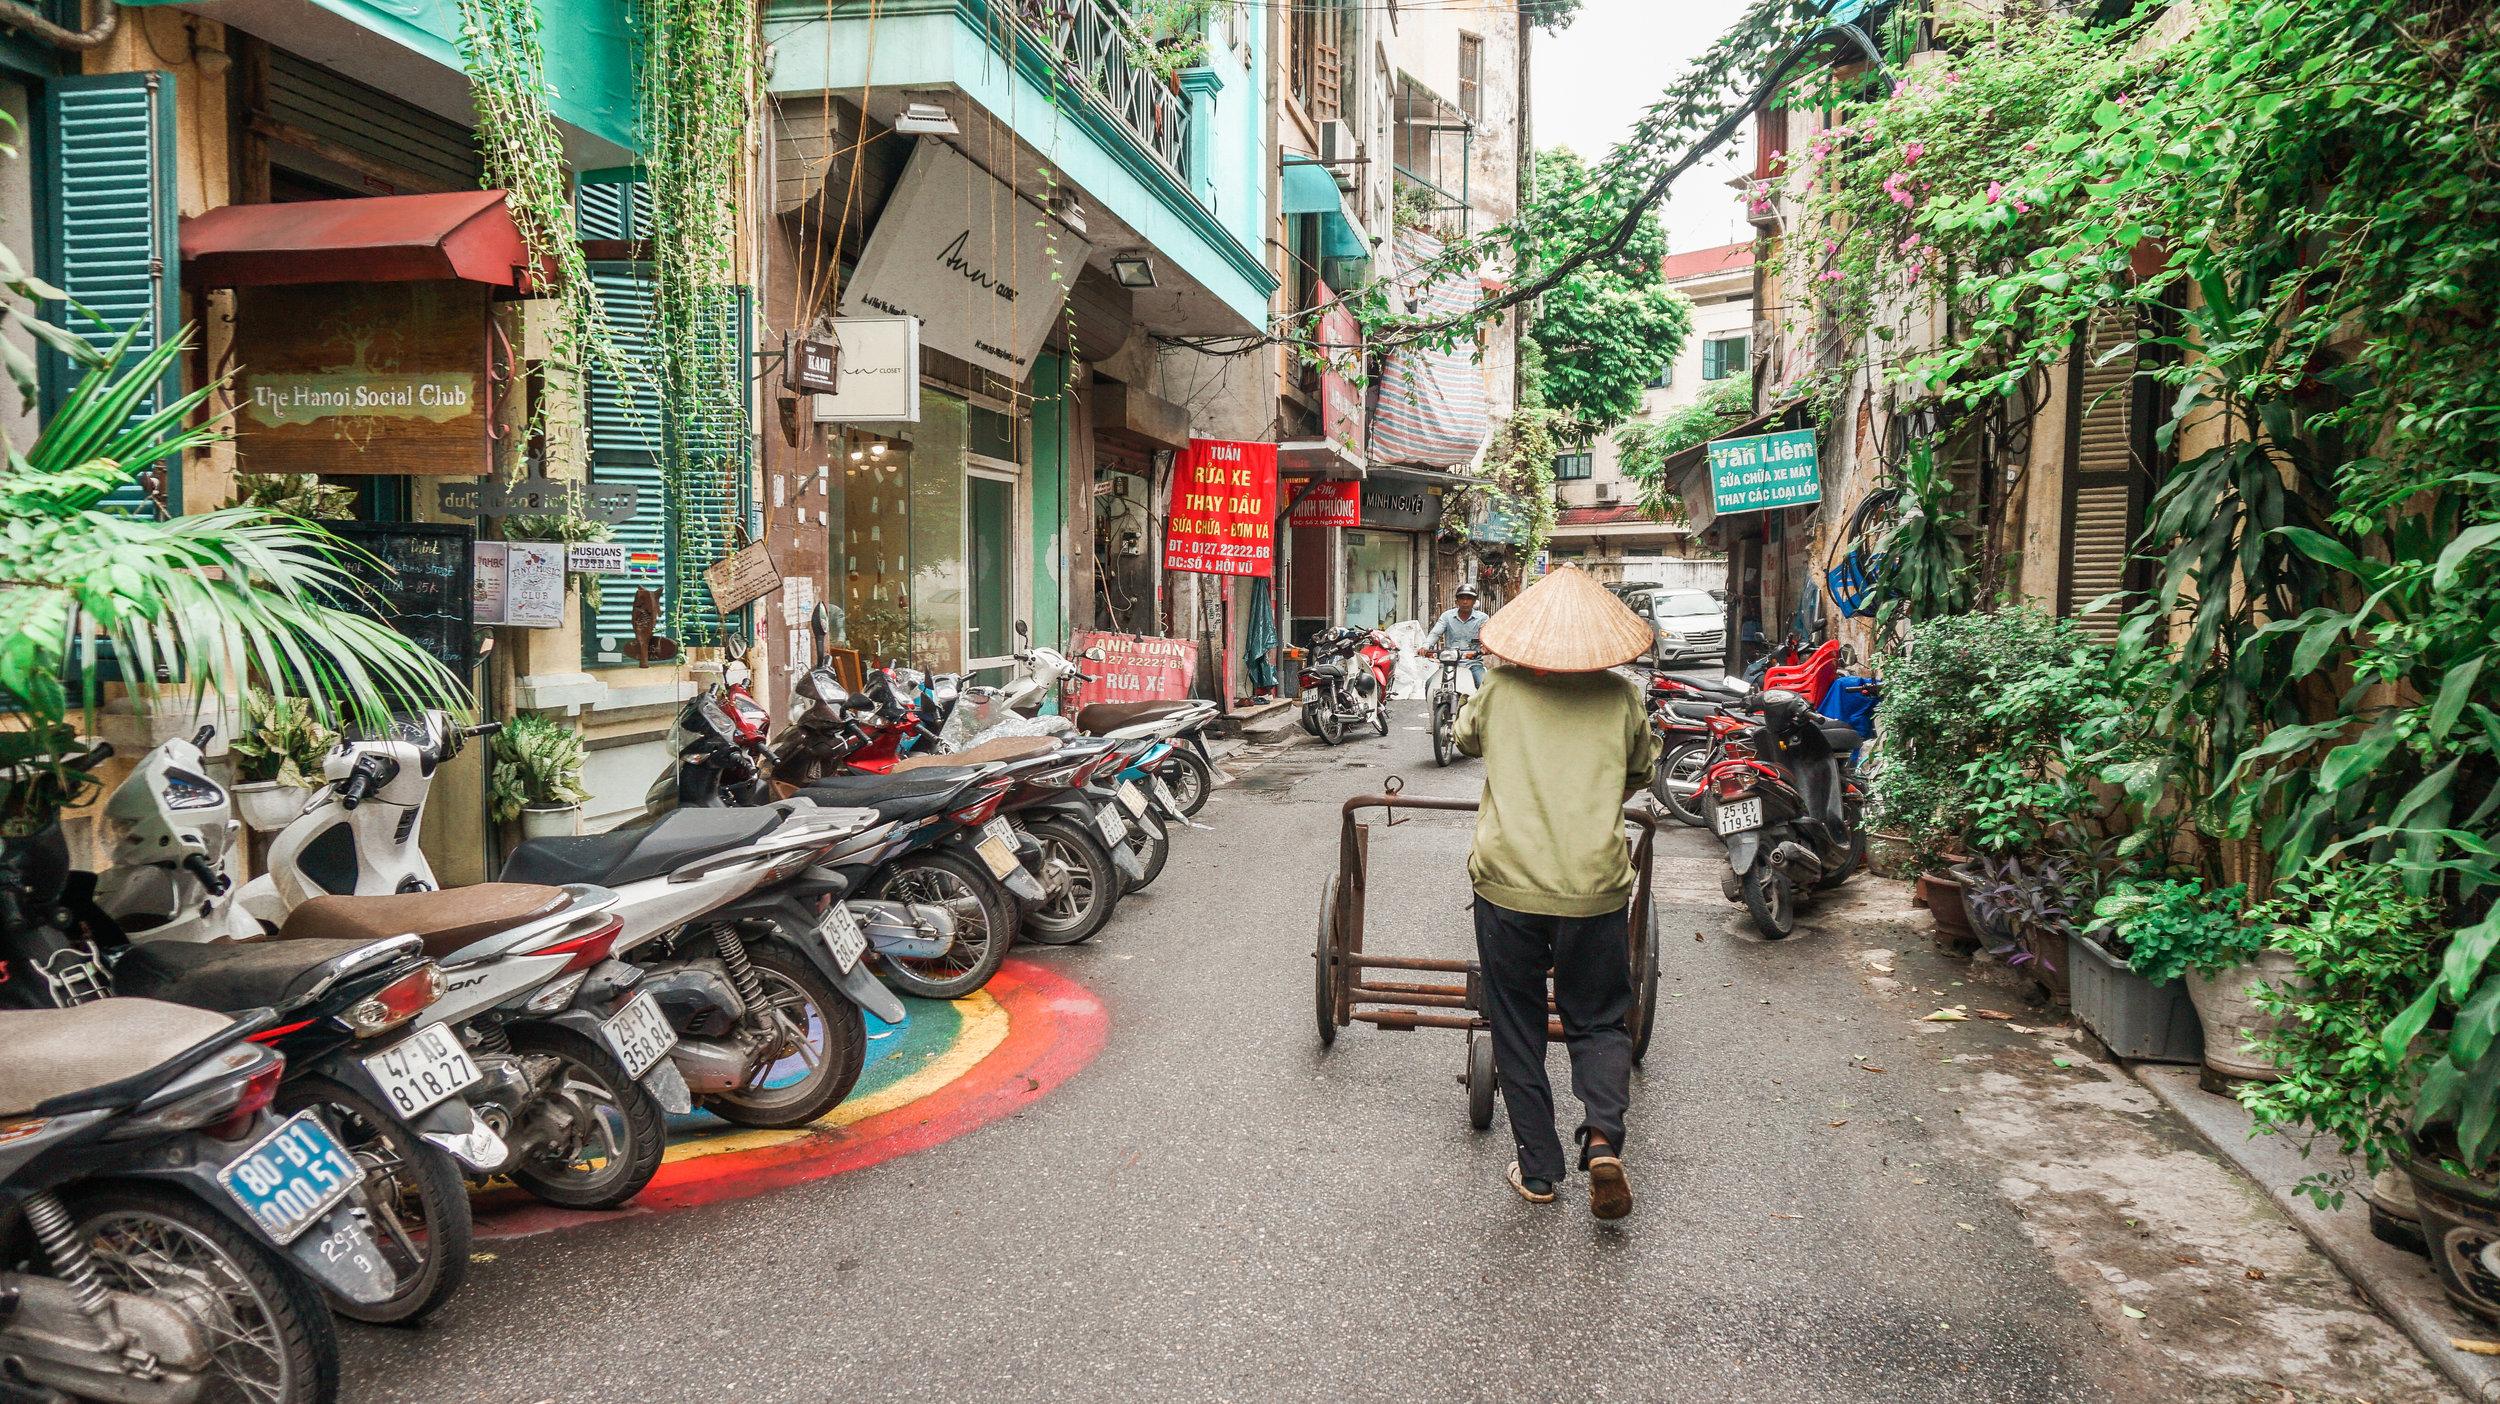 Hanoi-streets-2019.jpg